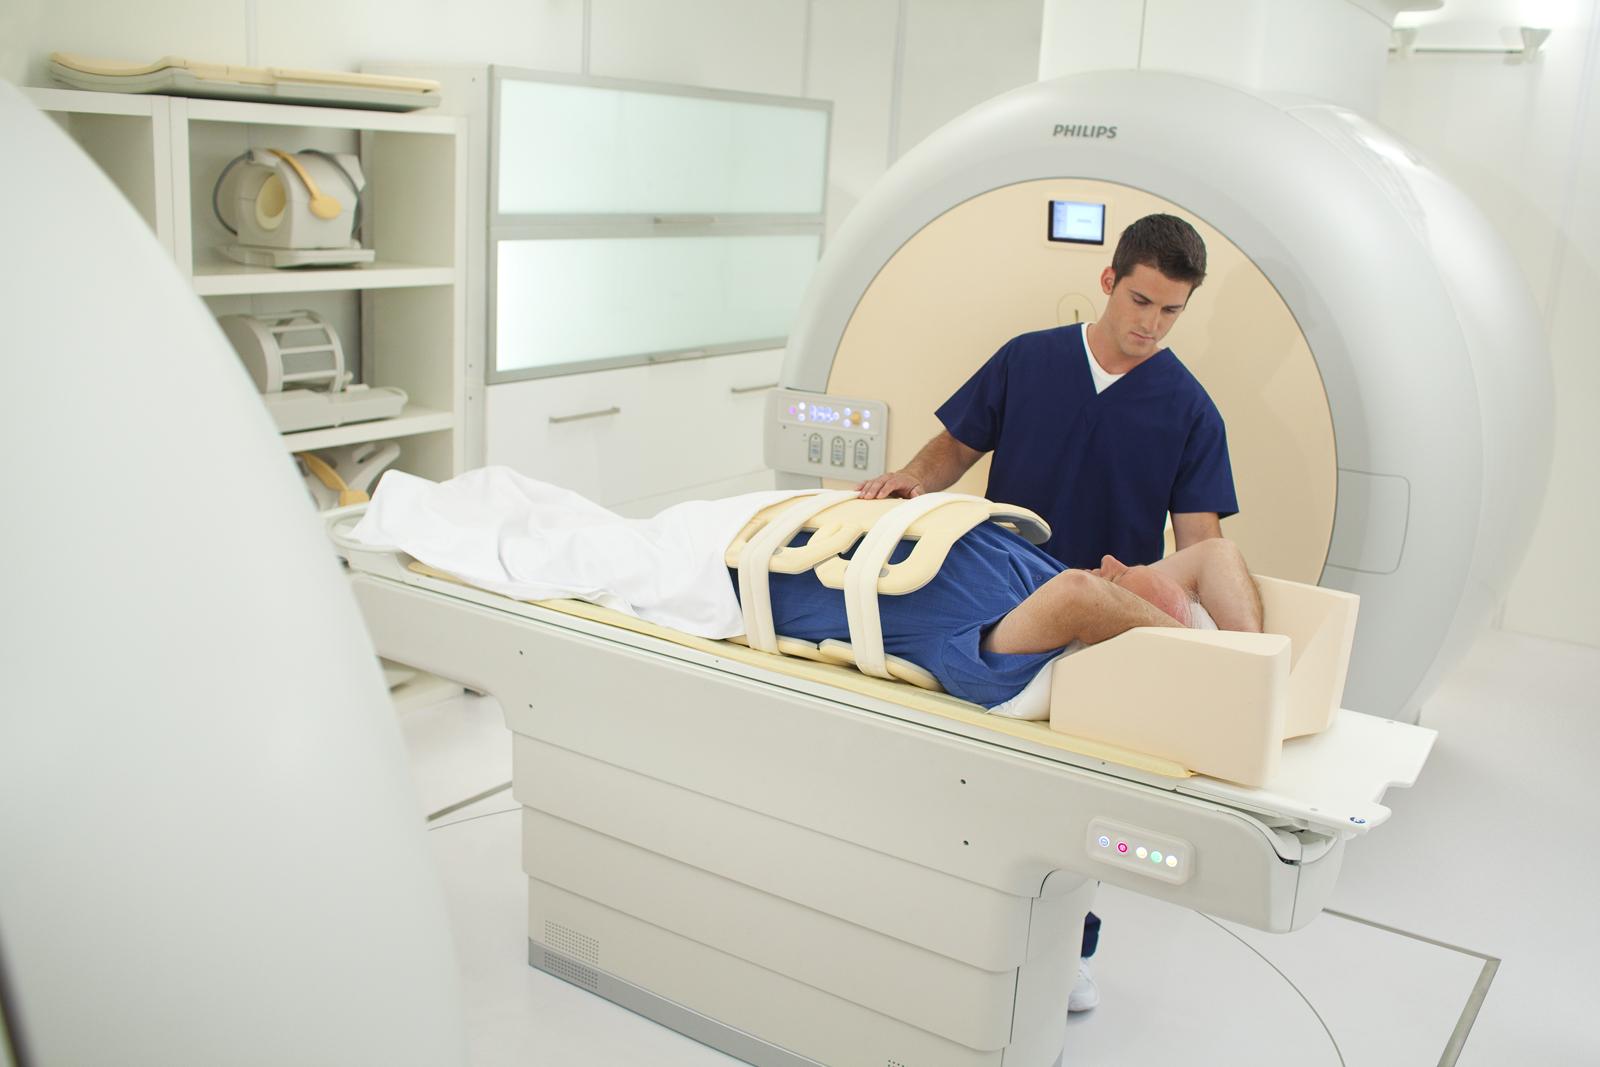 SNMMI, PET/MRI, PET/CT, foot pain, diagnosis, nuclear imaging